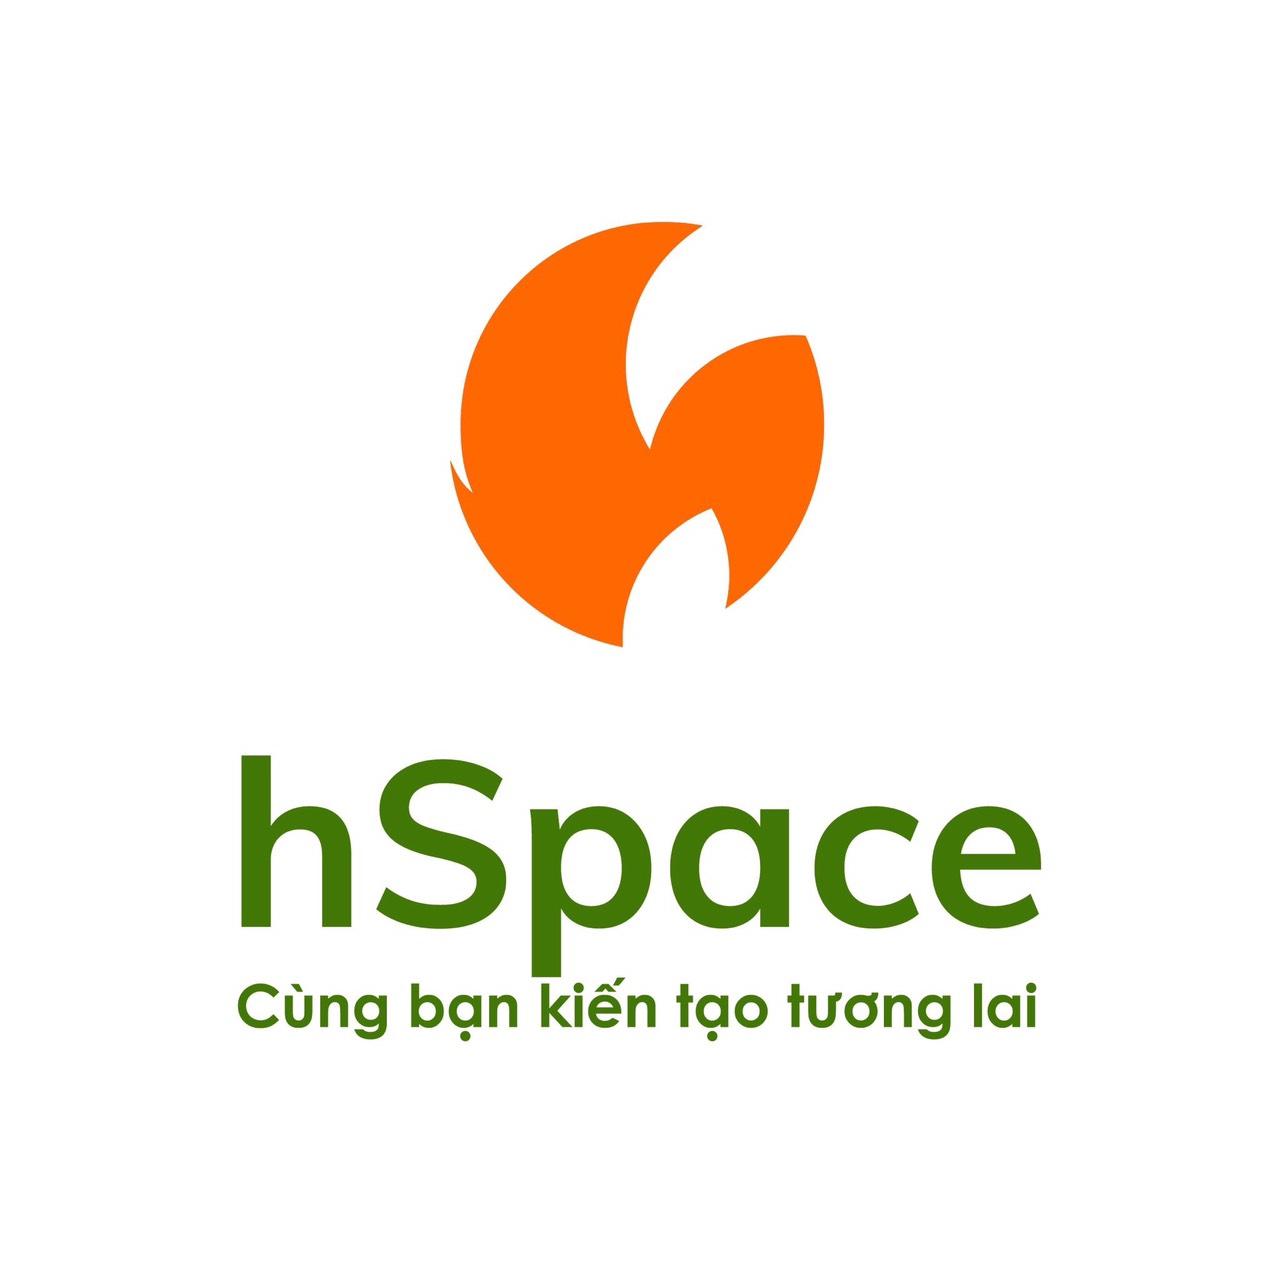 hSpace